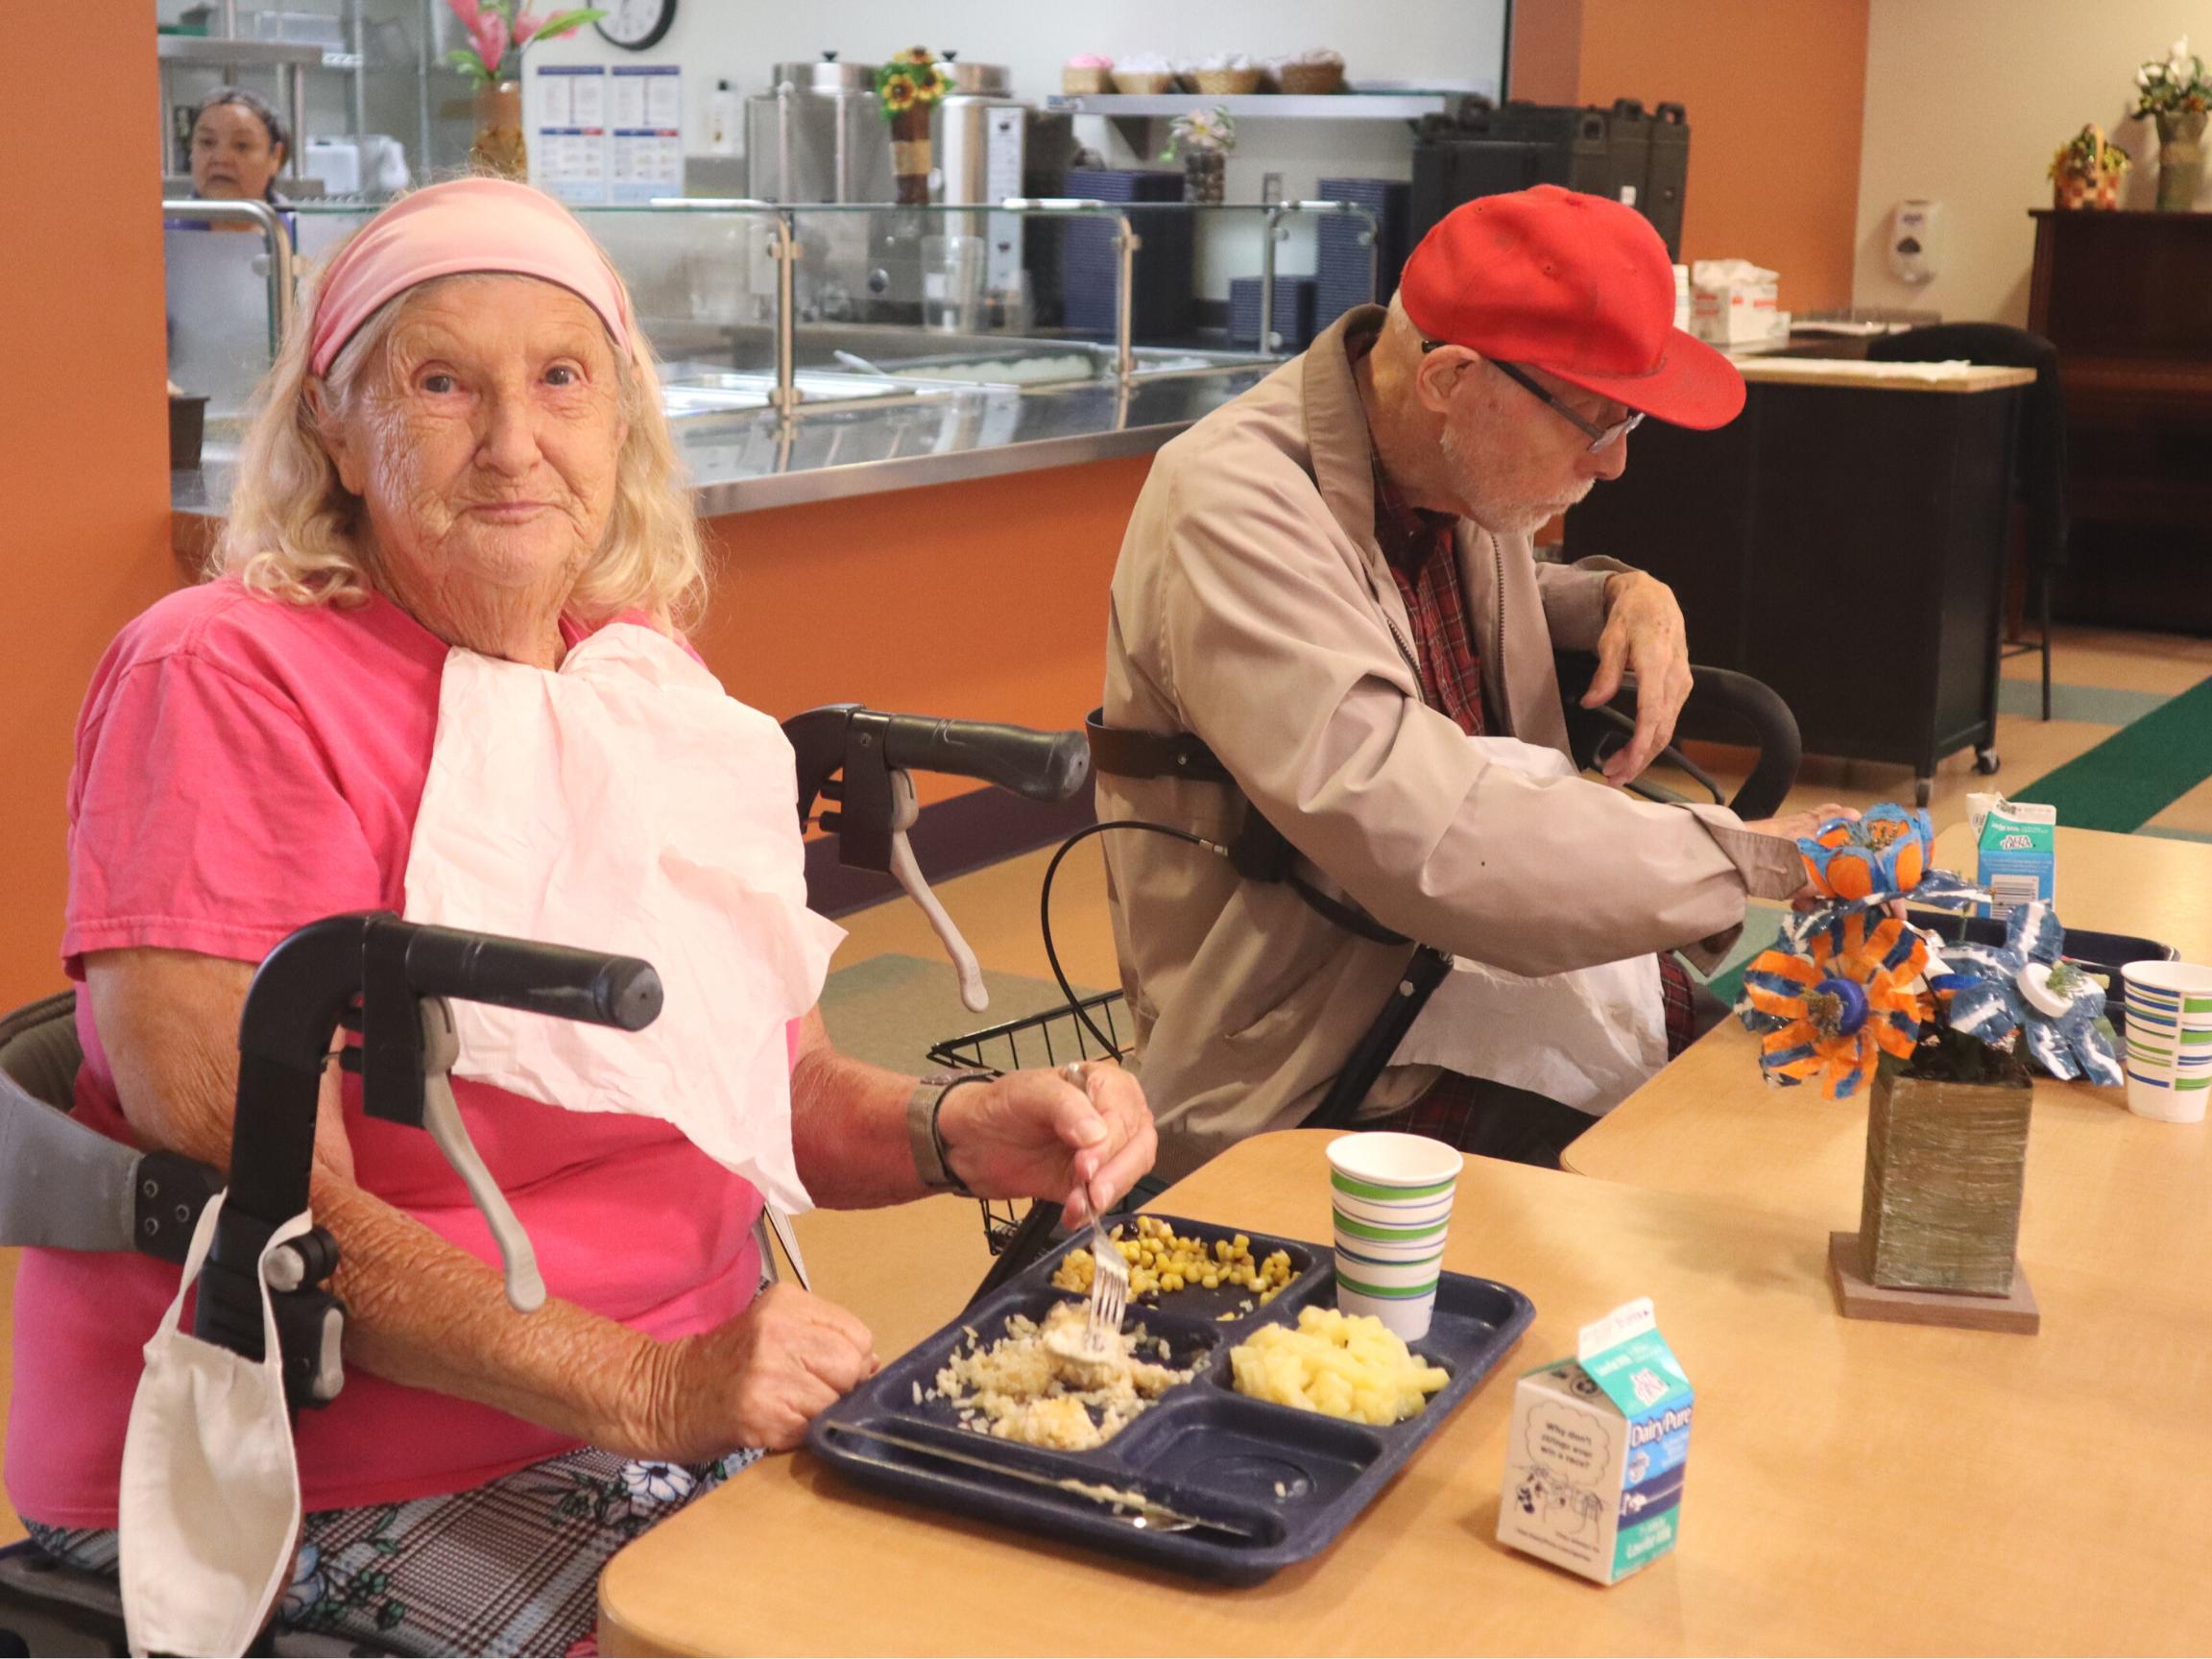 Feed a senior facing hunger